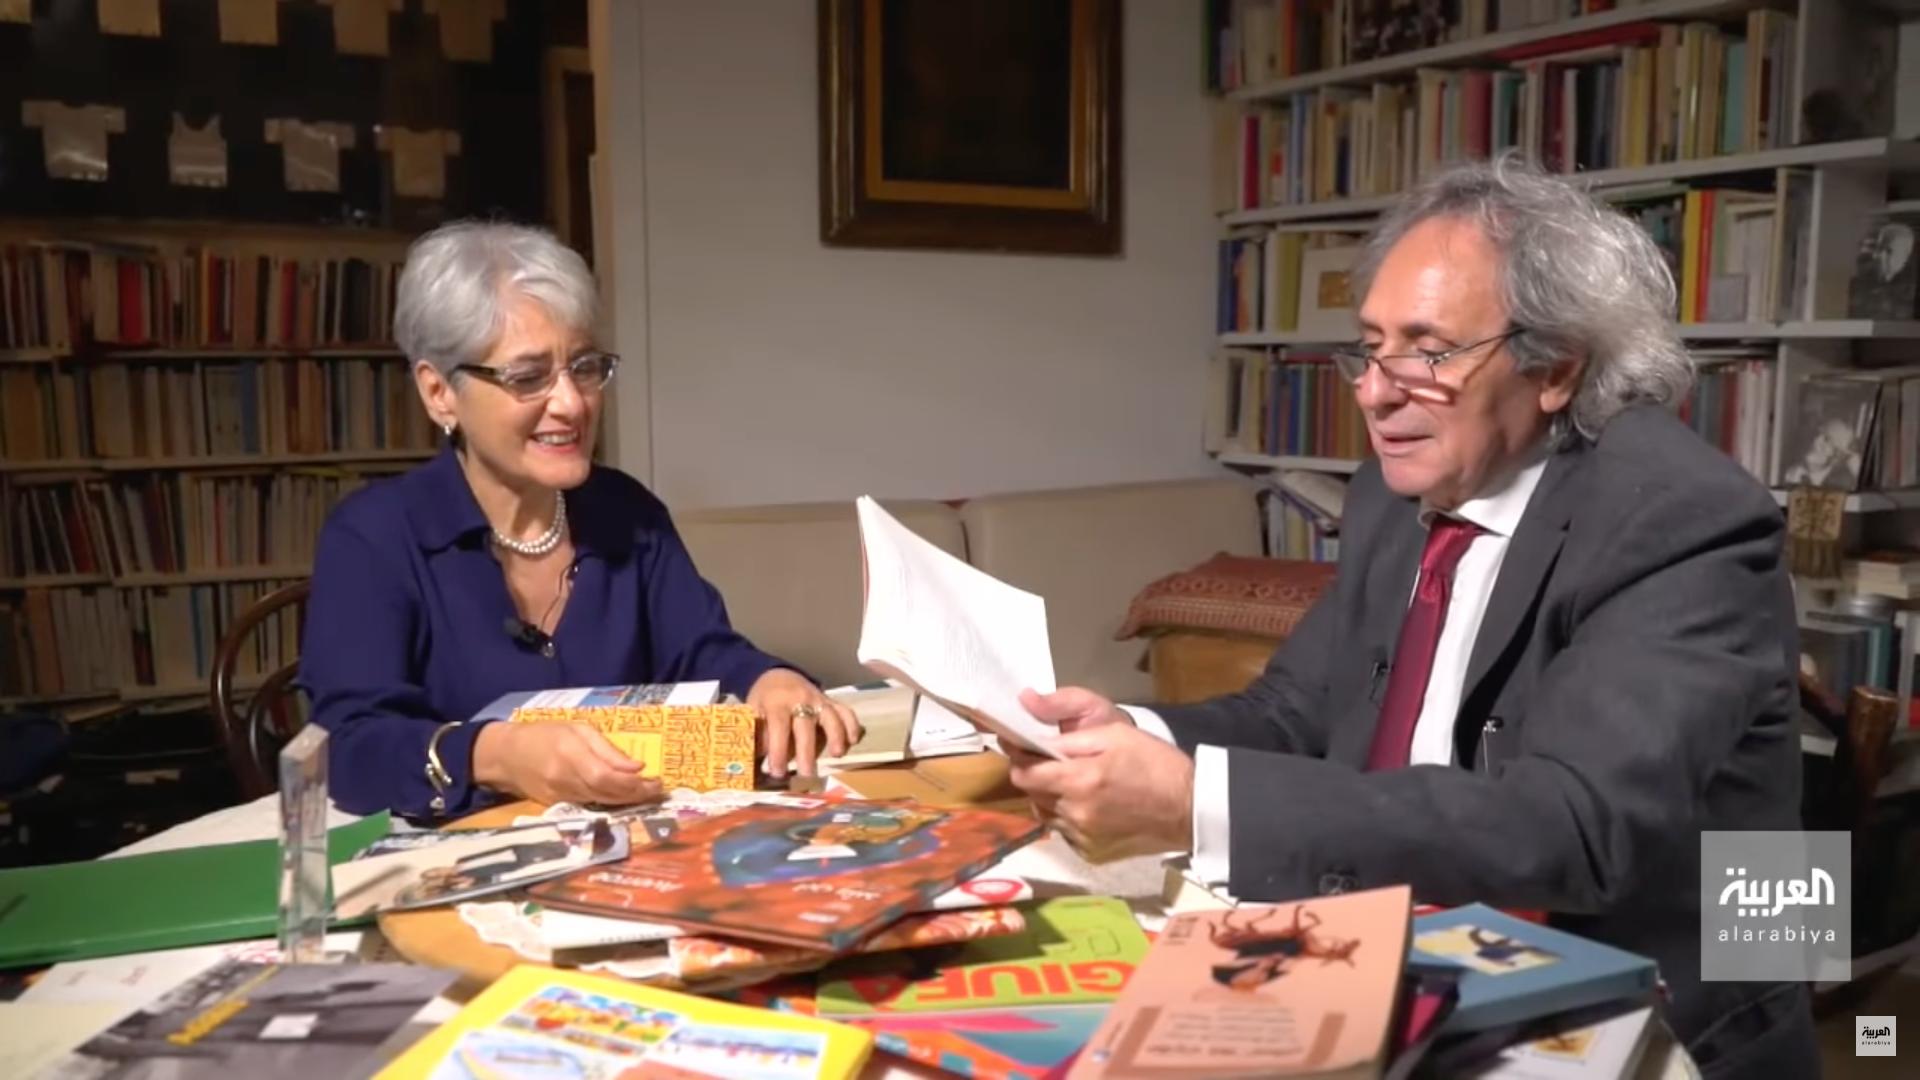 Intervista A Francesca Corrao Su Al Arabiya News Channel